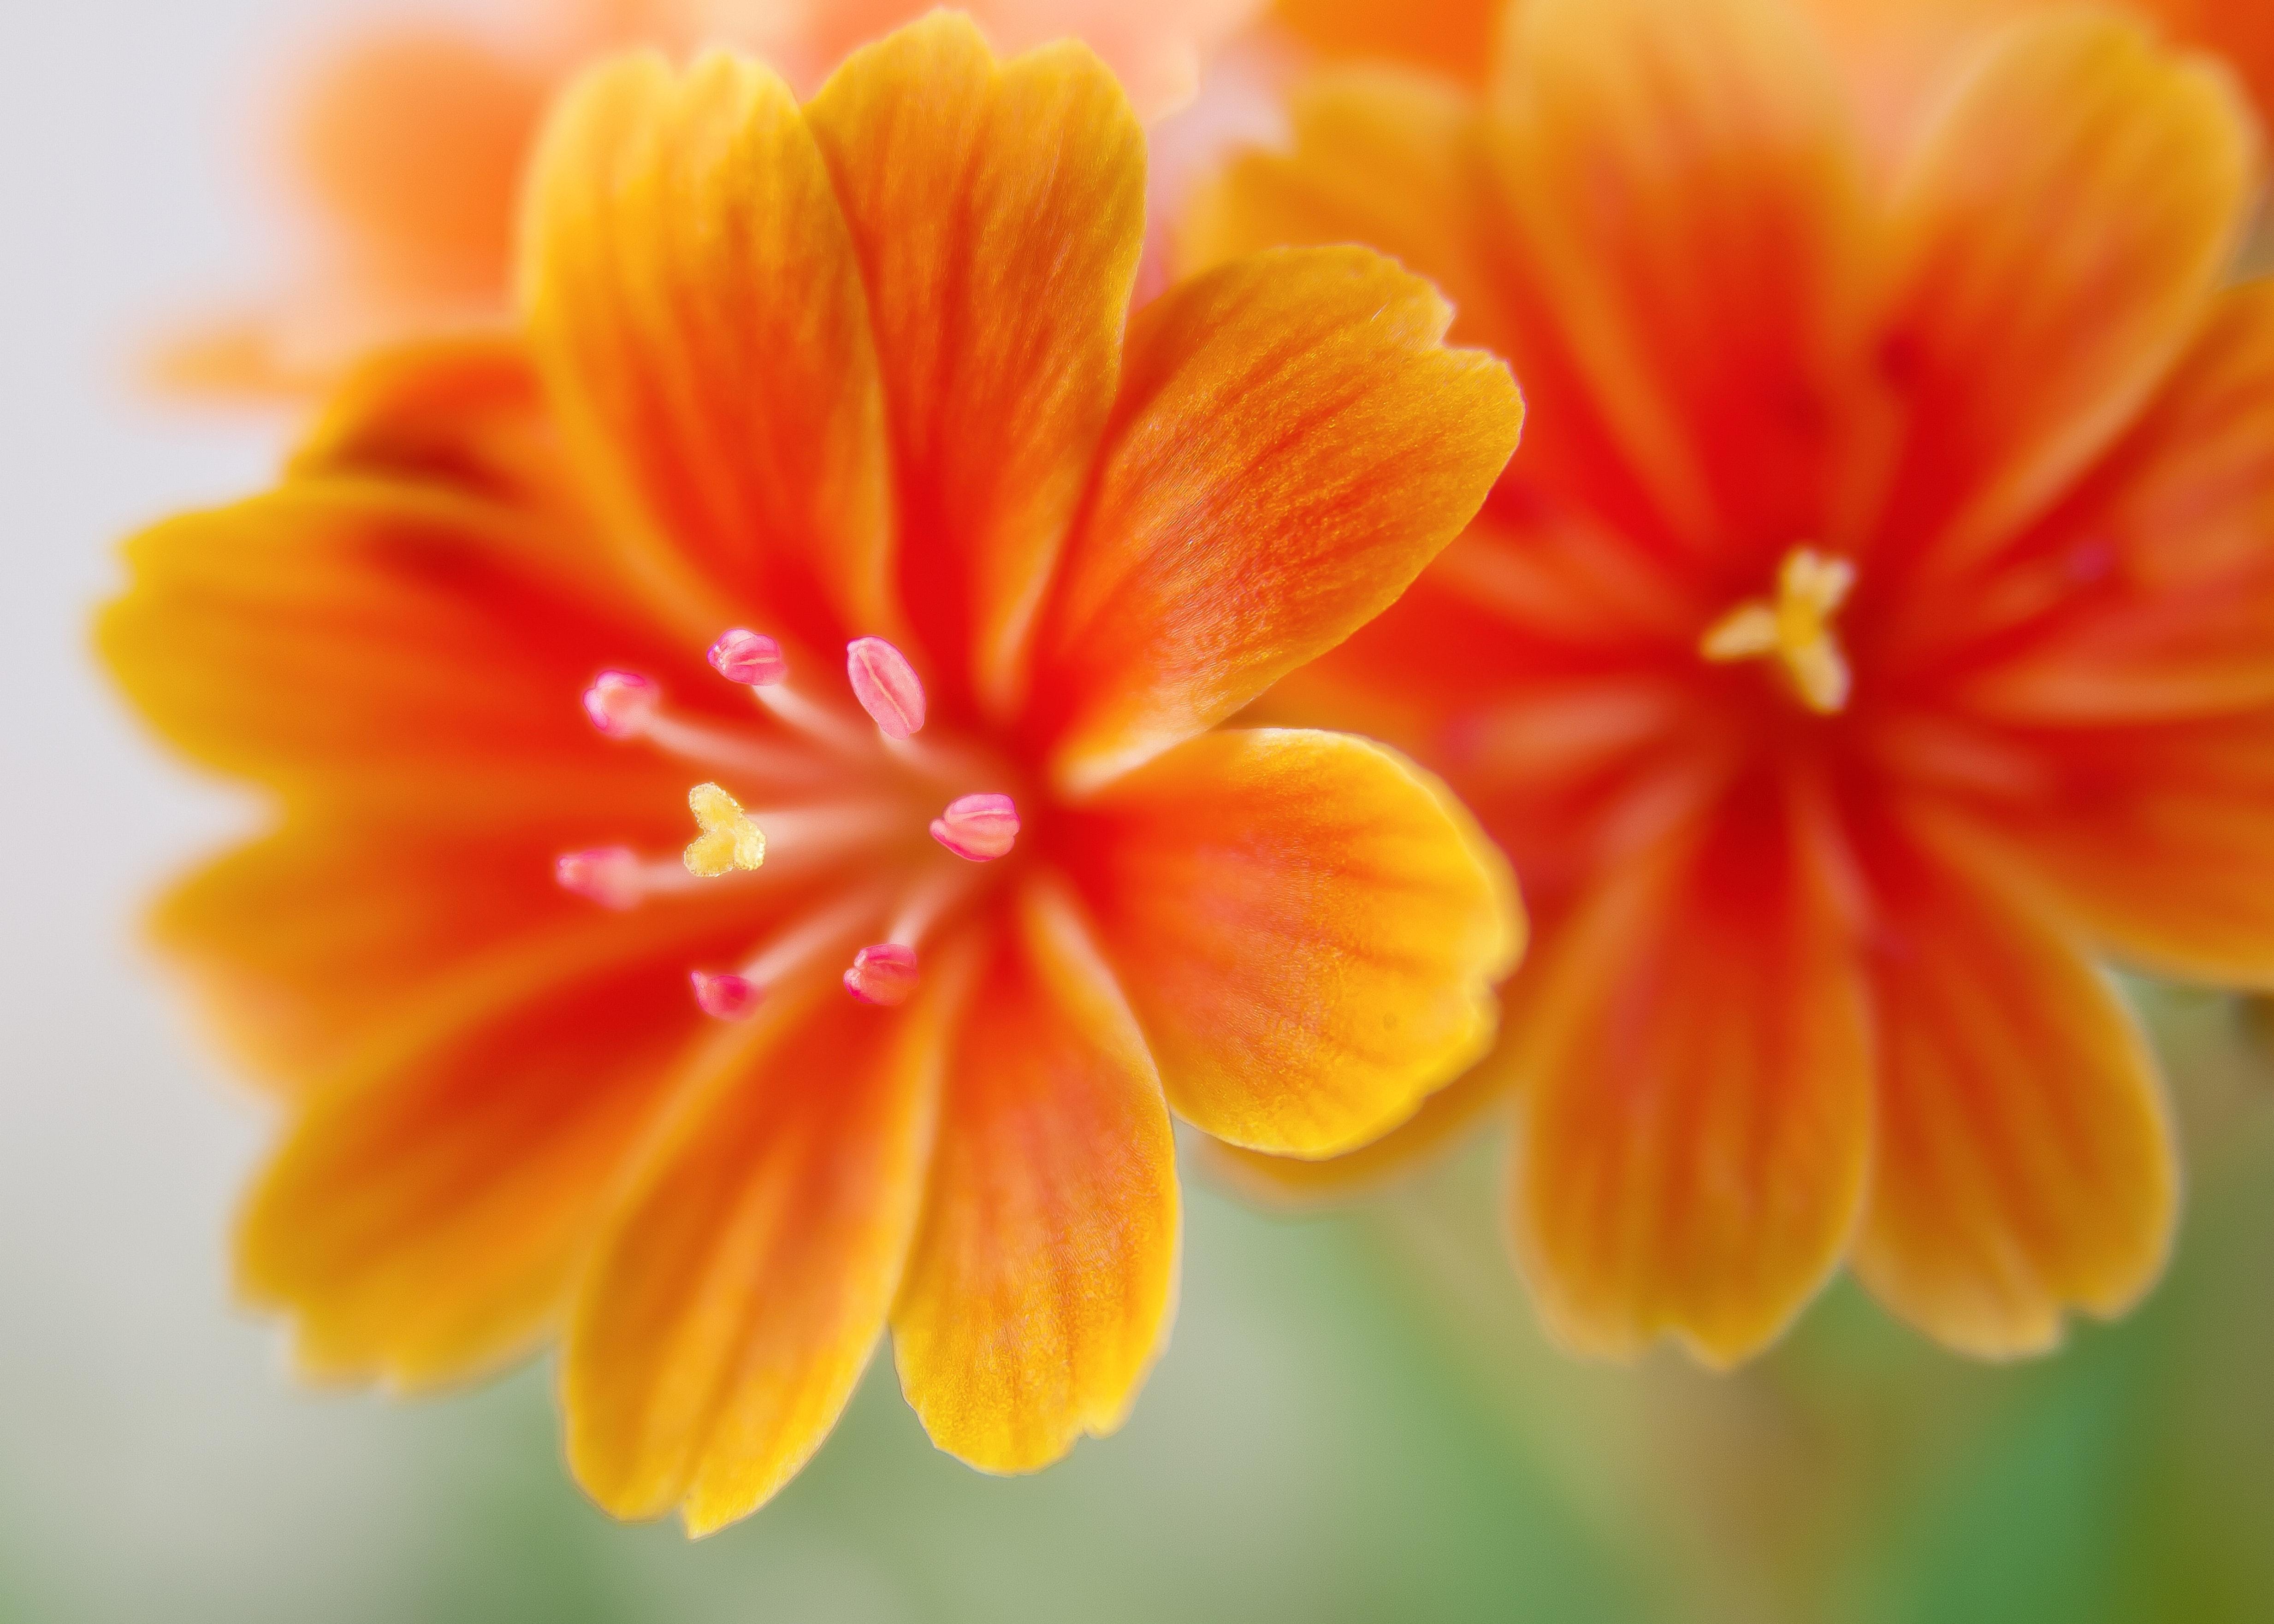 1000 Great Orange Flowers Photos Pexels Free Stock Photos